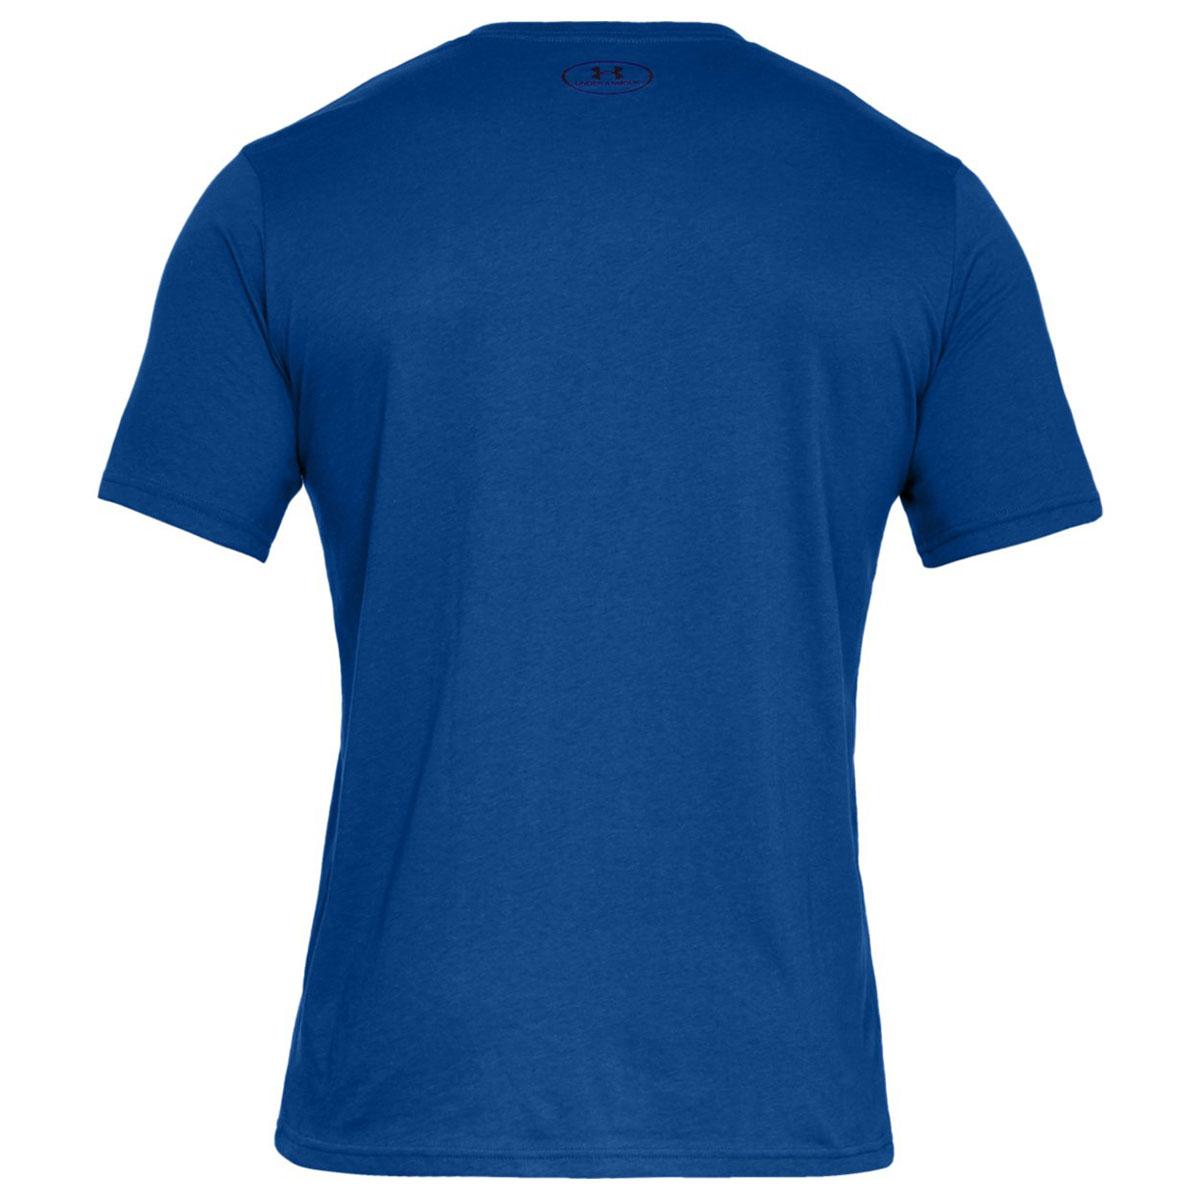 Under-Armour-Mens-2019-UA-Boxed-Sportstyle-HeatGear-Training-Gym-T-Shirt-Tee thumbnail 17